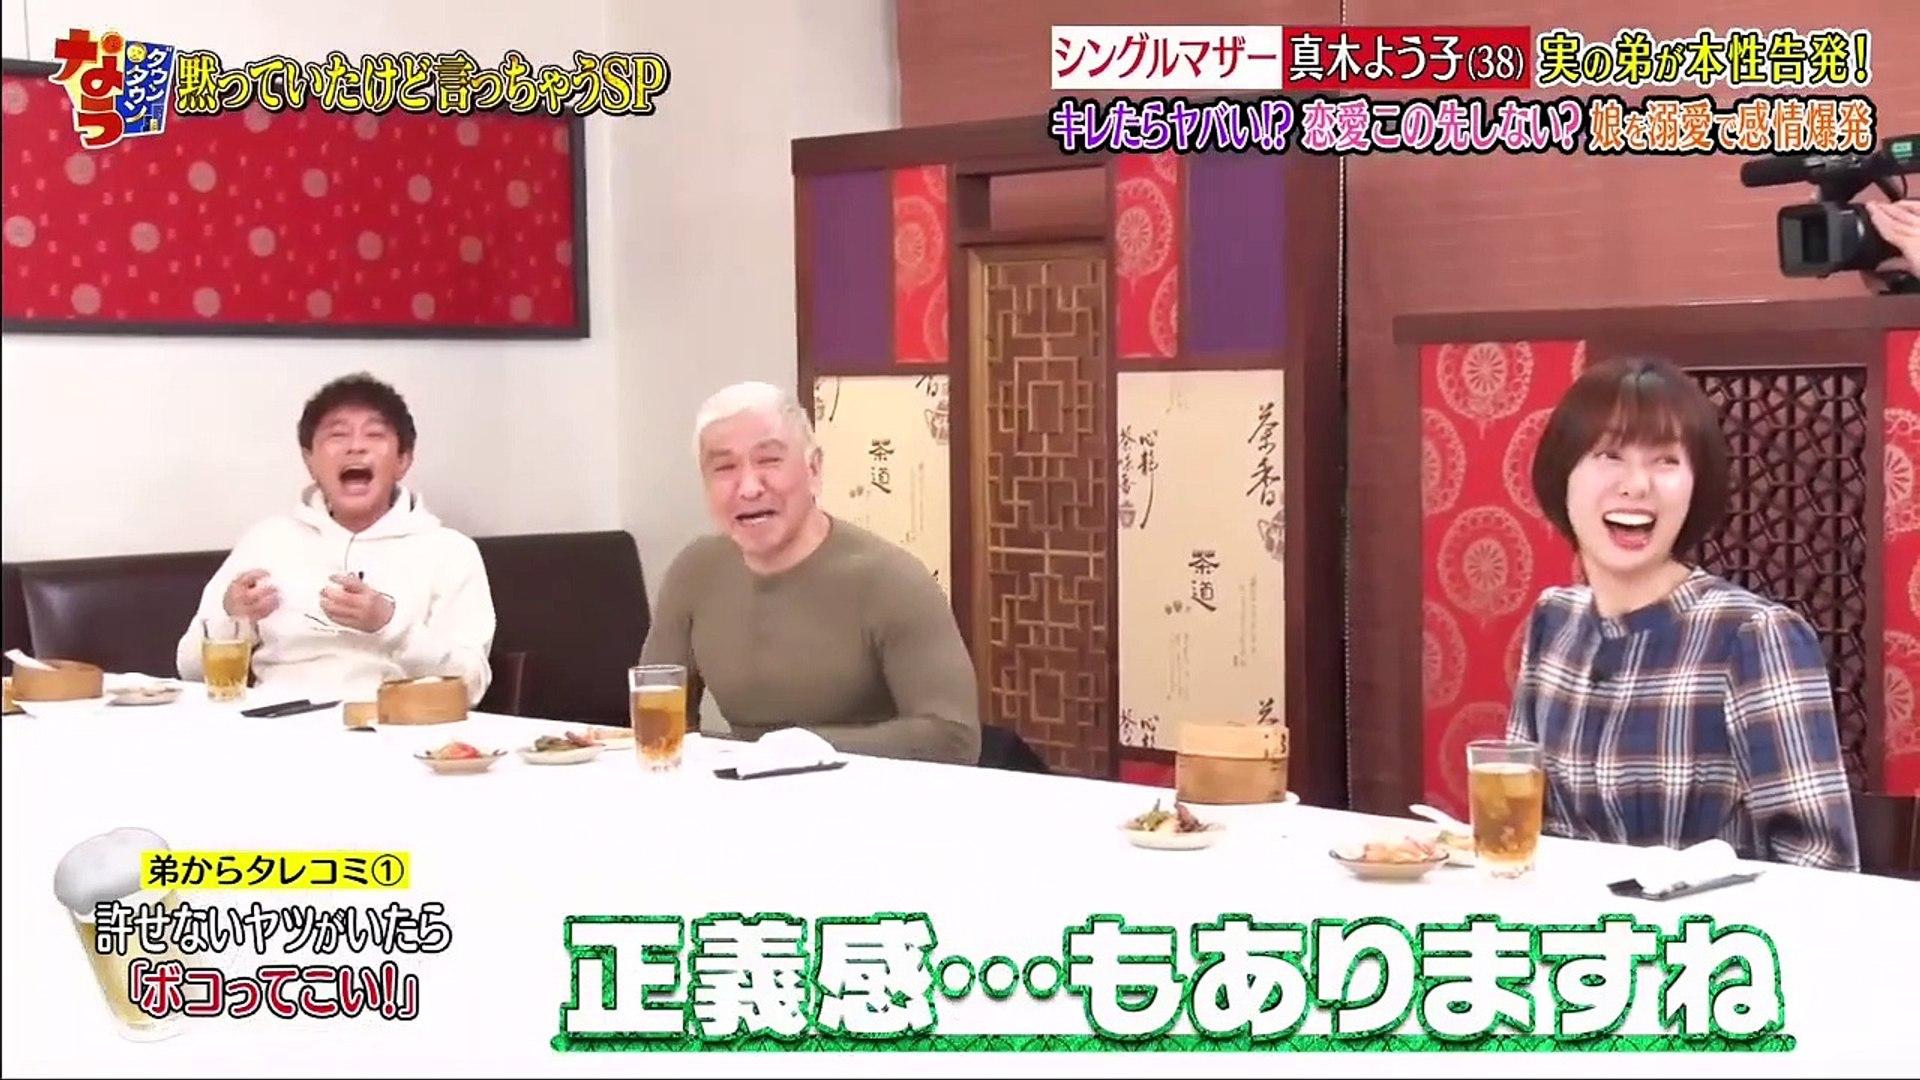 9tsu ダウンタウンなう 動画